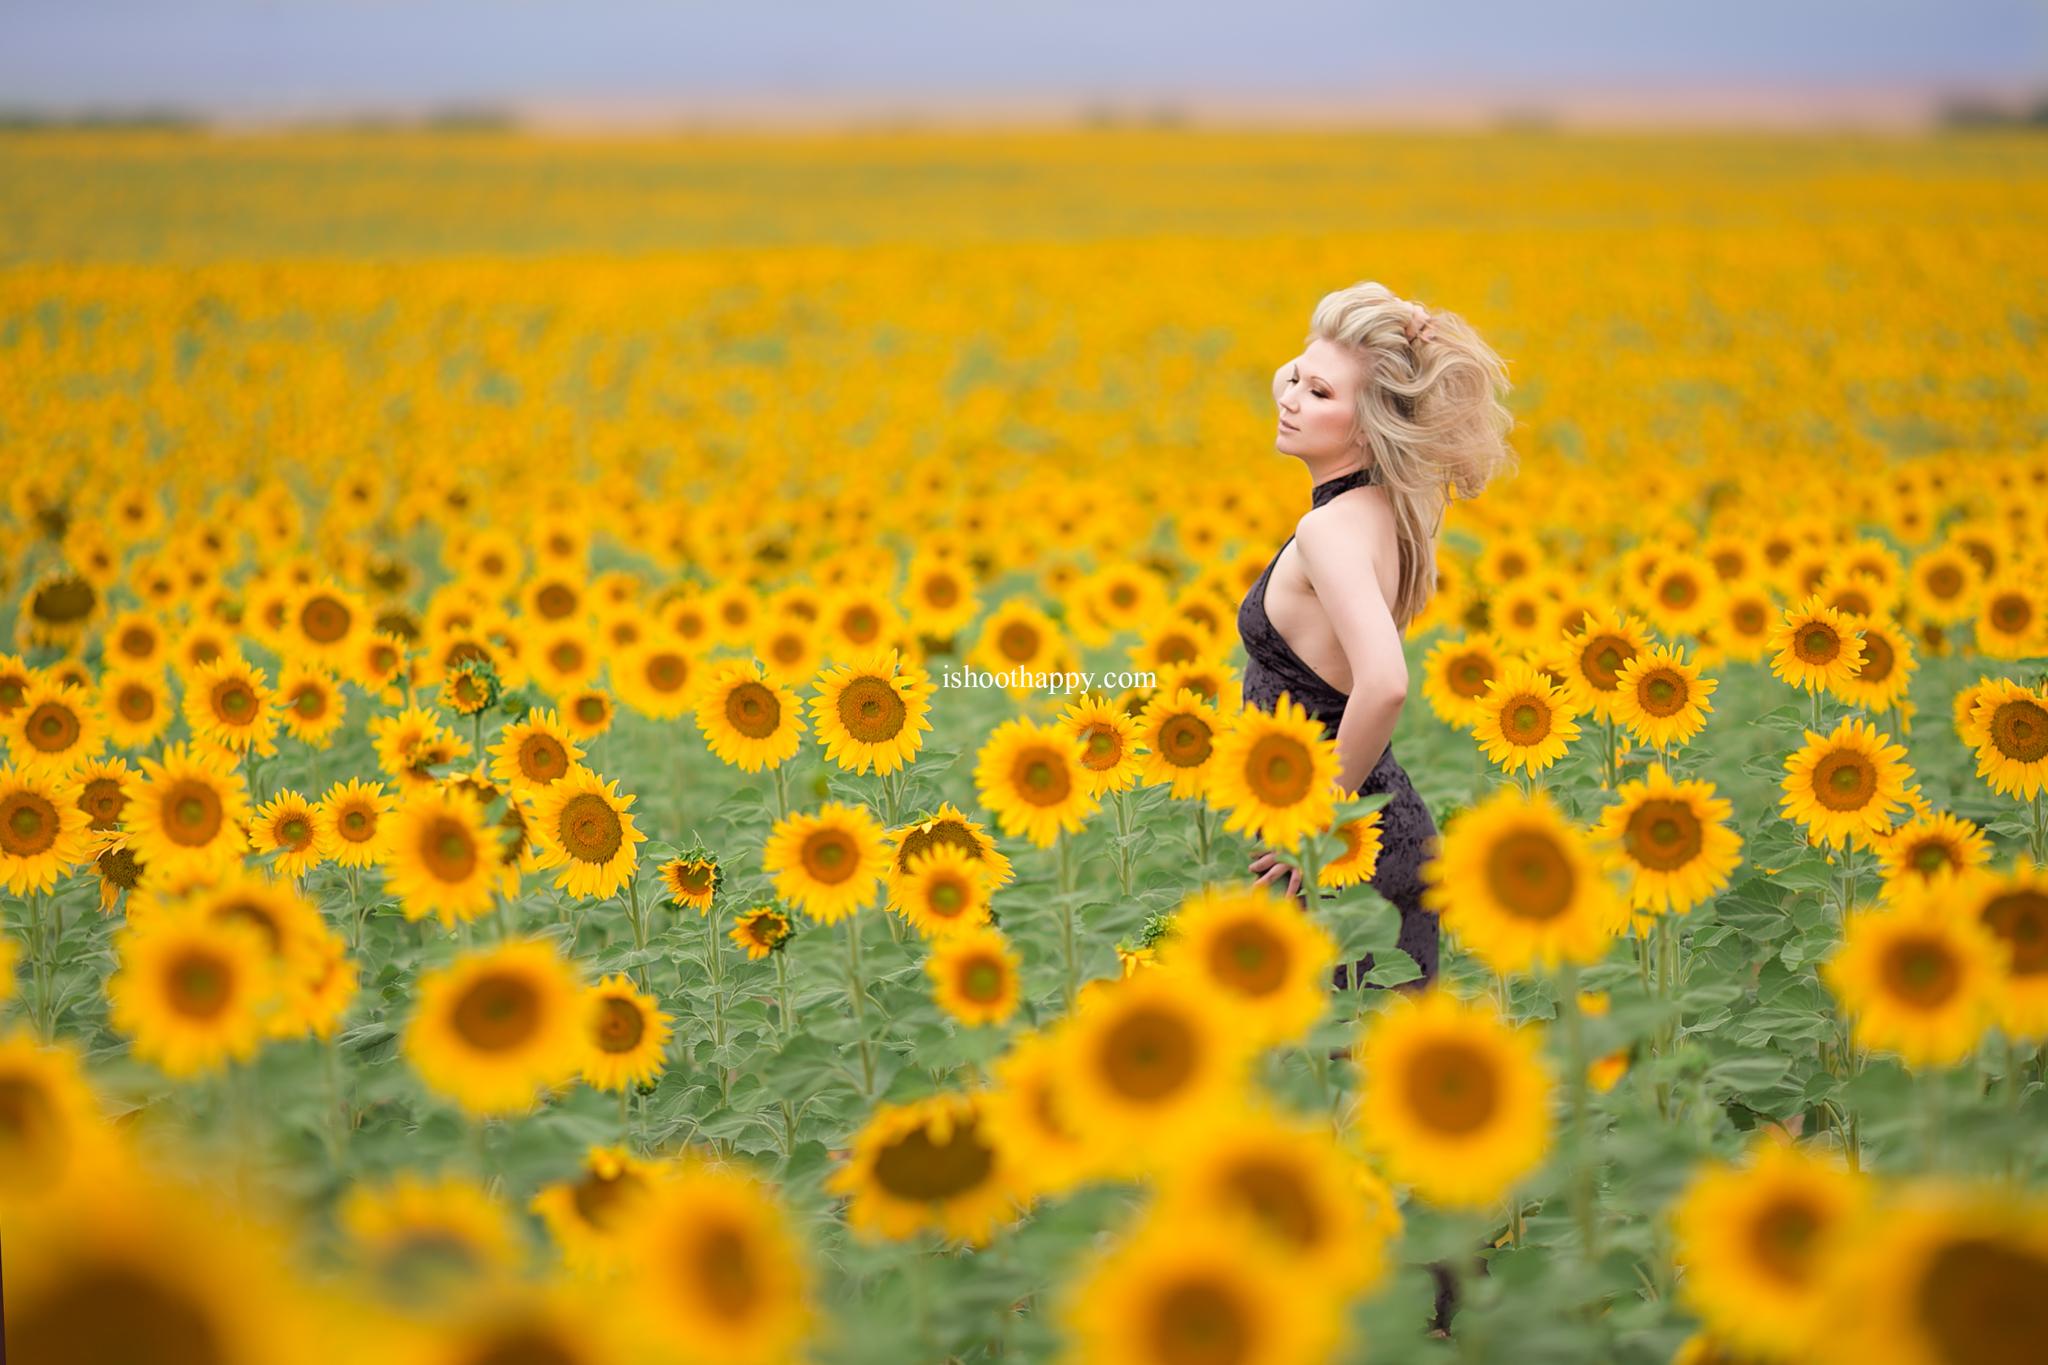 Denver fine art portraiture, Denver portrait photographer, whimsical photography in Denver, beautiful portraits, denver best portrait photographer, sunflower field, beautiful girl in a sunflower field